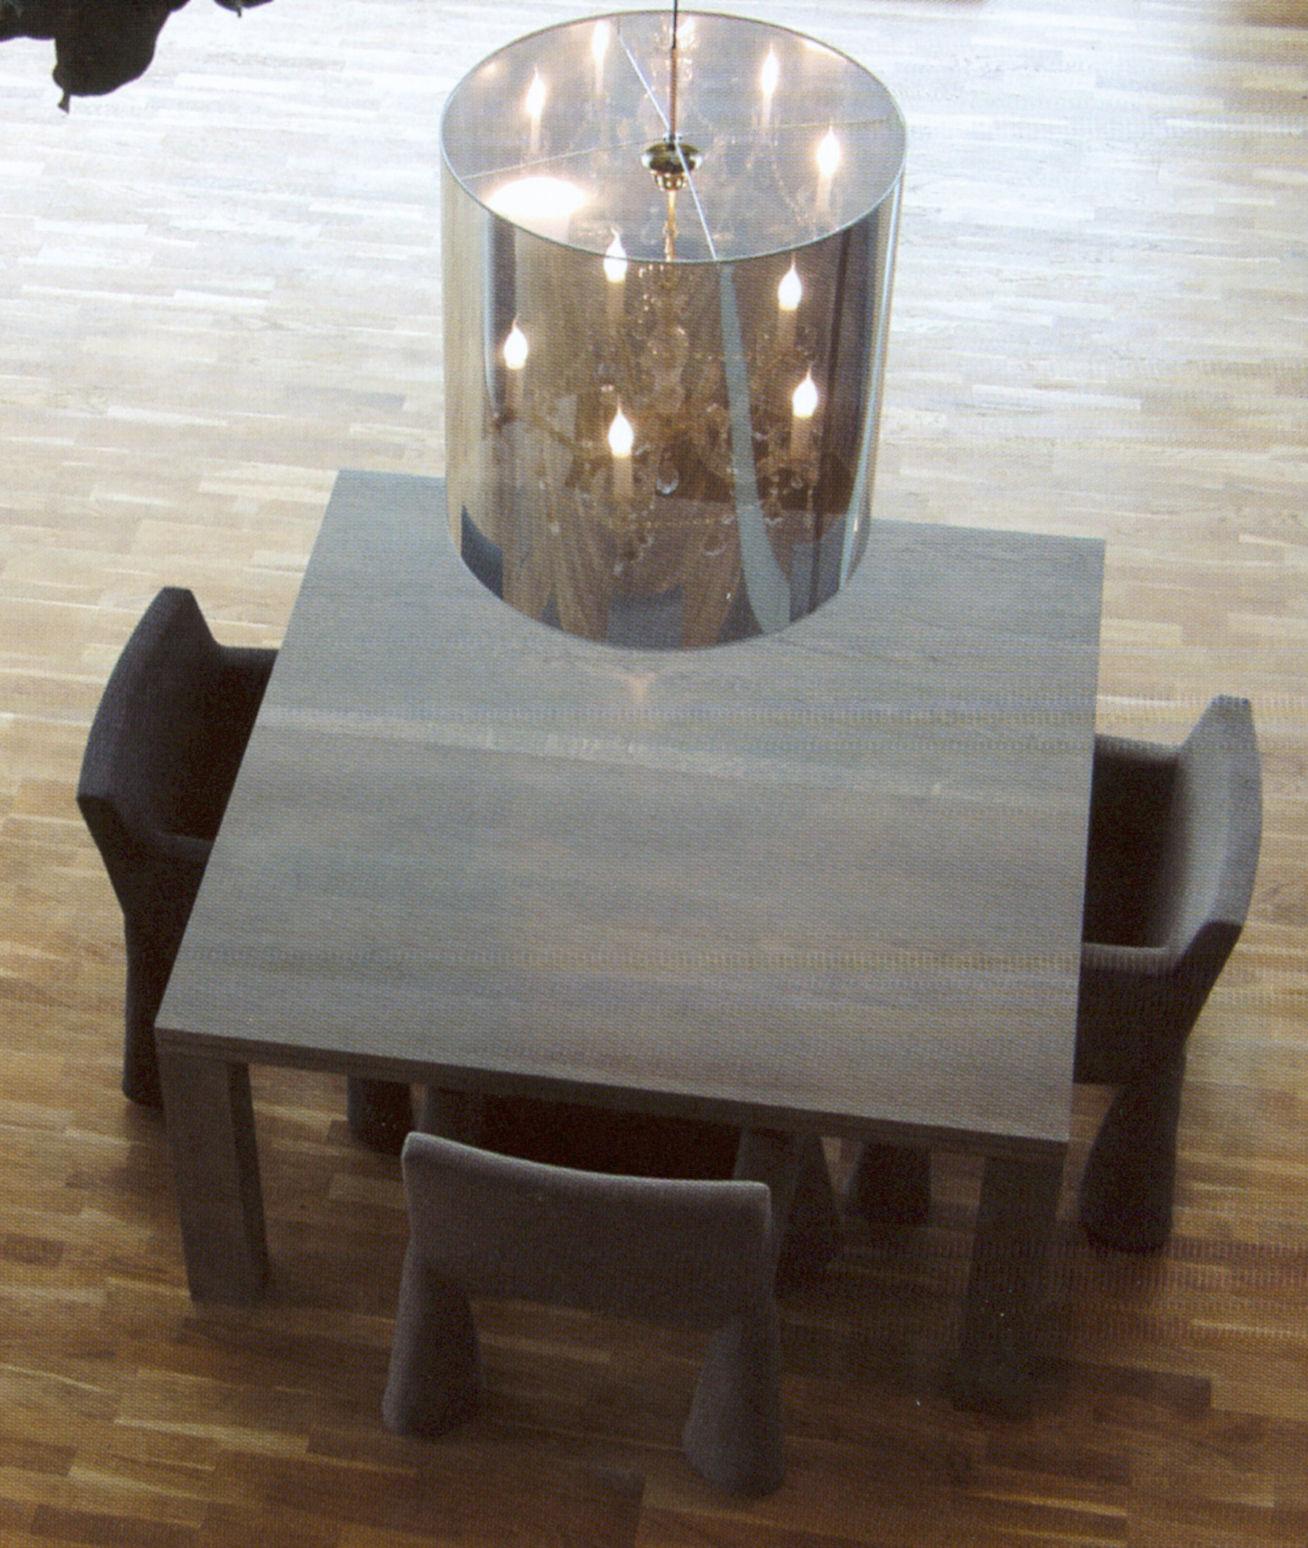 suspension light shade shade 70 cm miroir et argent 70 cm moooi. Black Bedroom Furniture Sets. Home Design Ideas